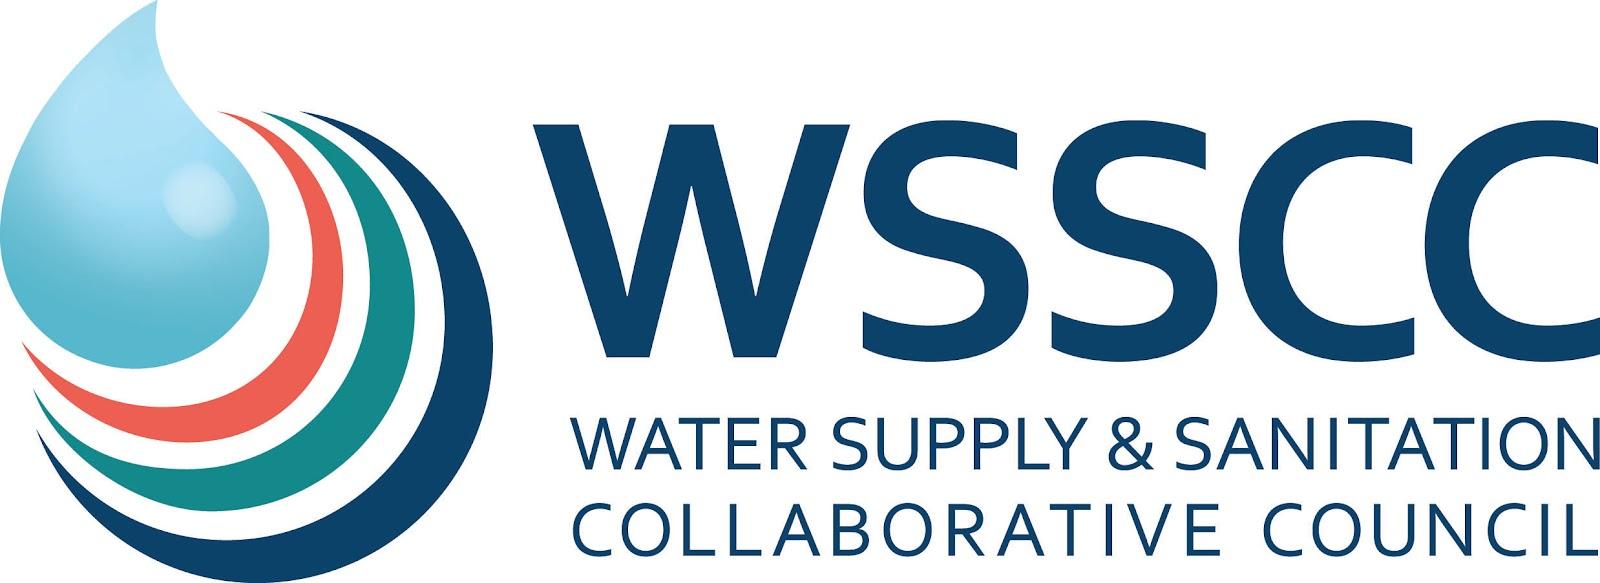 WSSCC_logo_CMYK.jpg